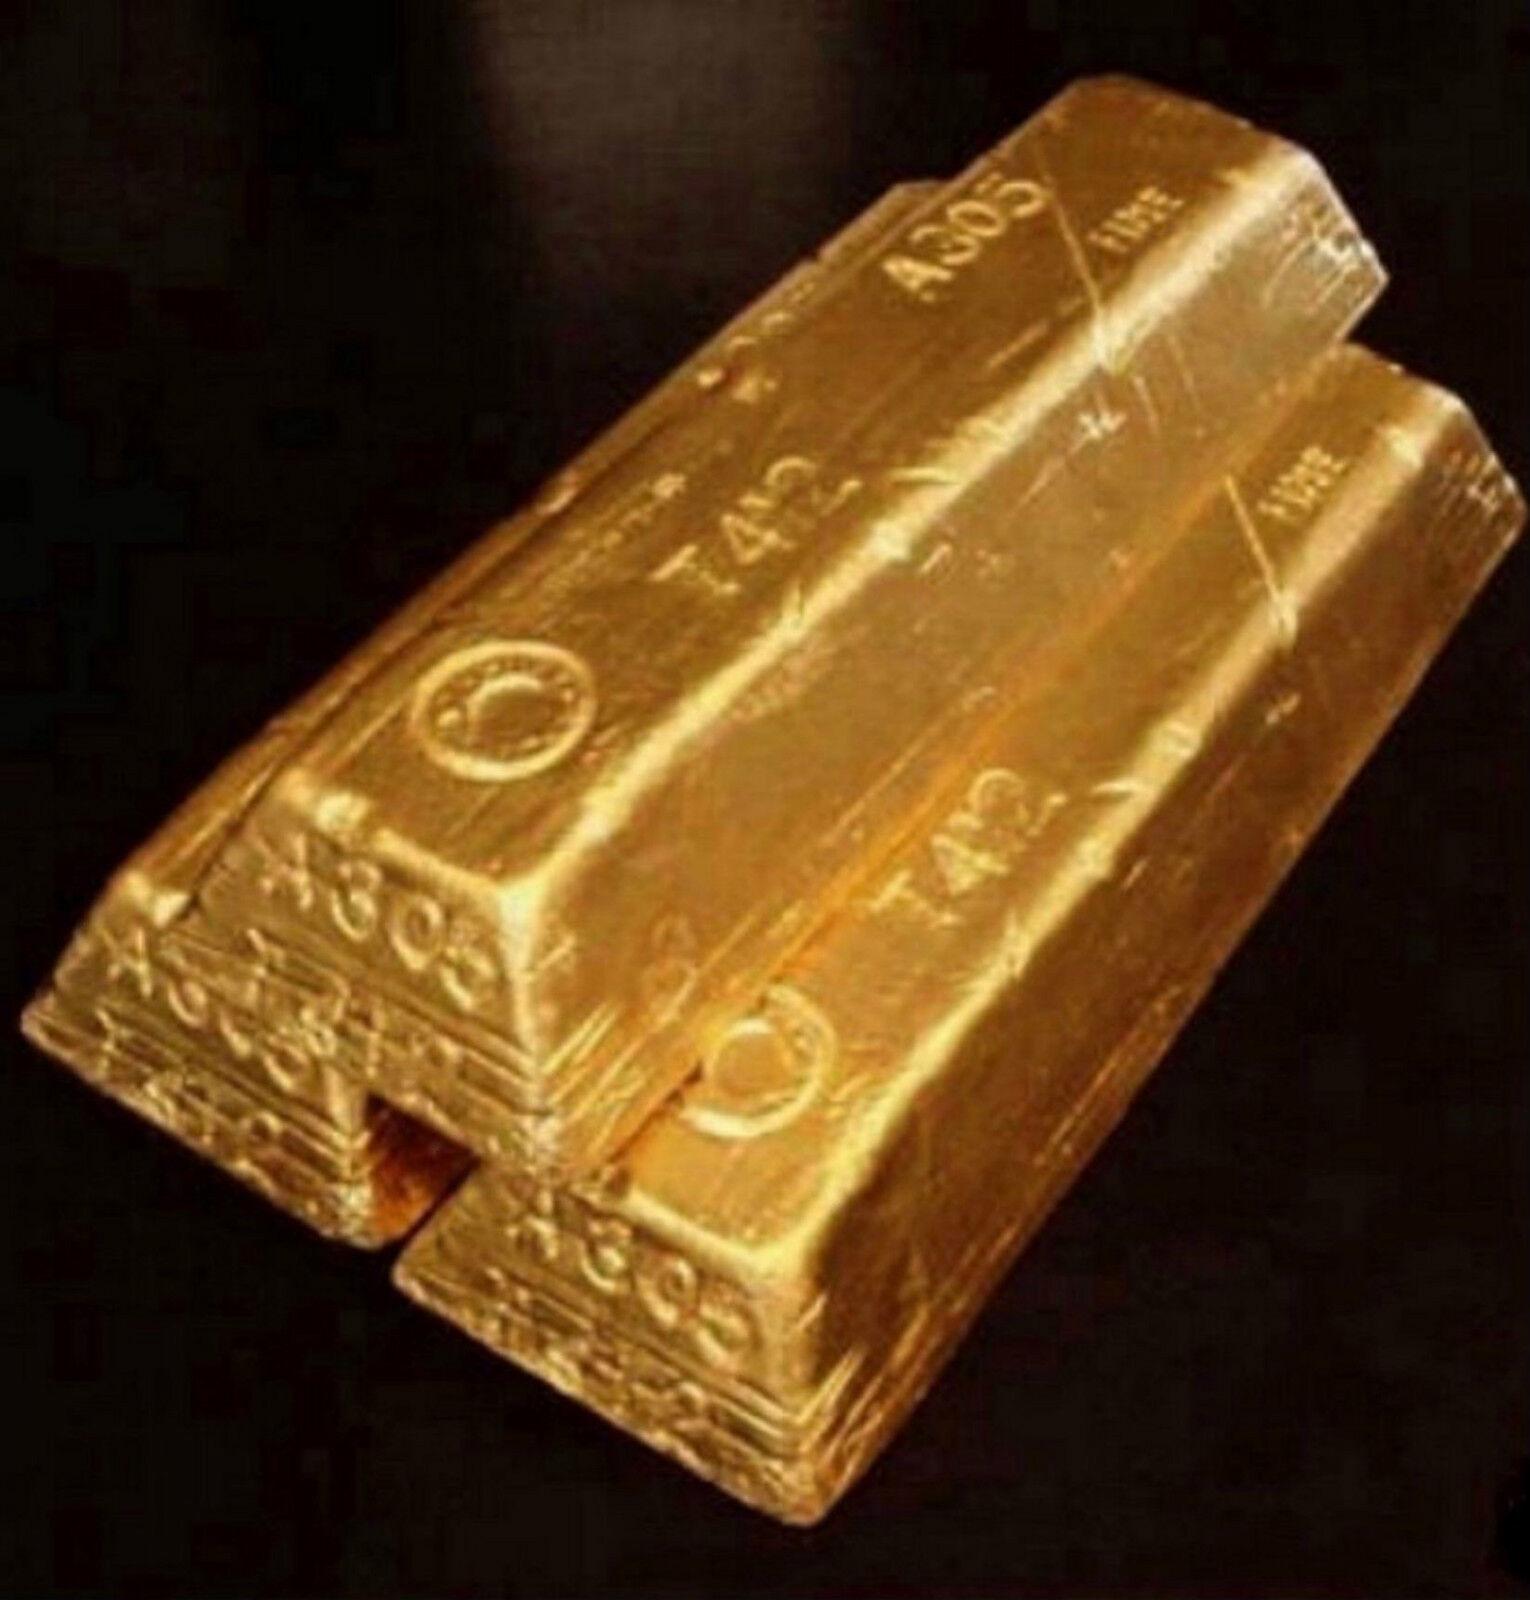 NEW 3 Gold Bar Fort Knox Brick Ingot Die Hard Movie Prop Replica Treasure  - $39.99